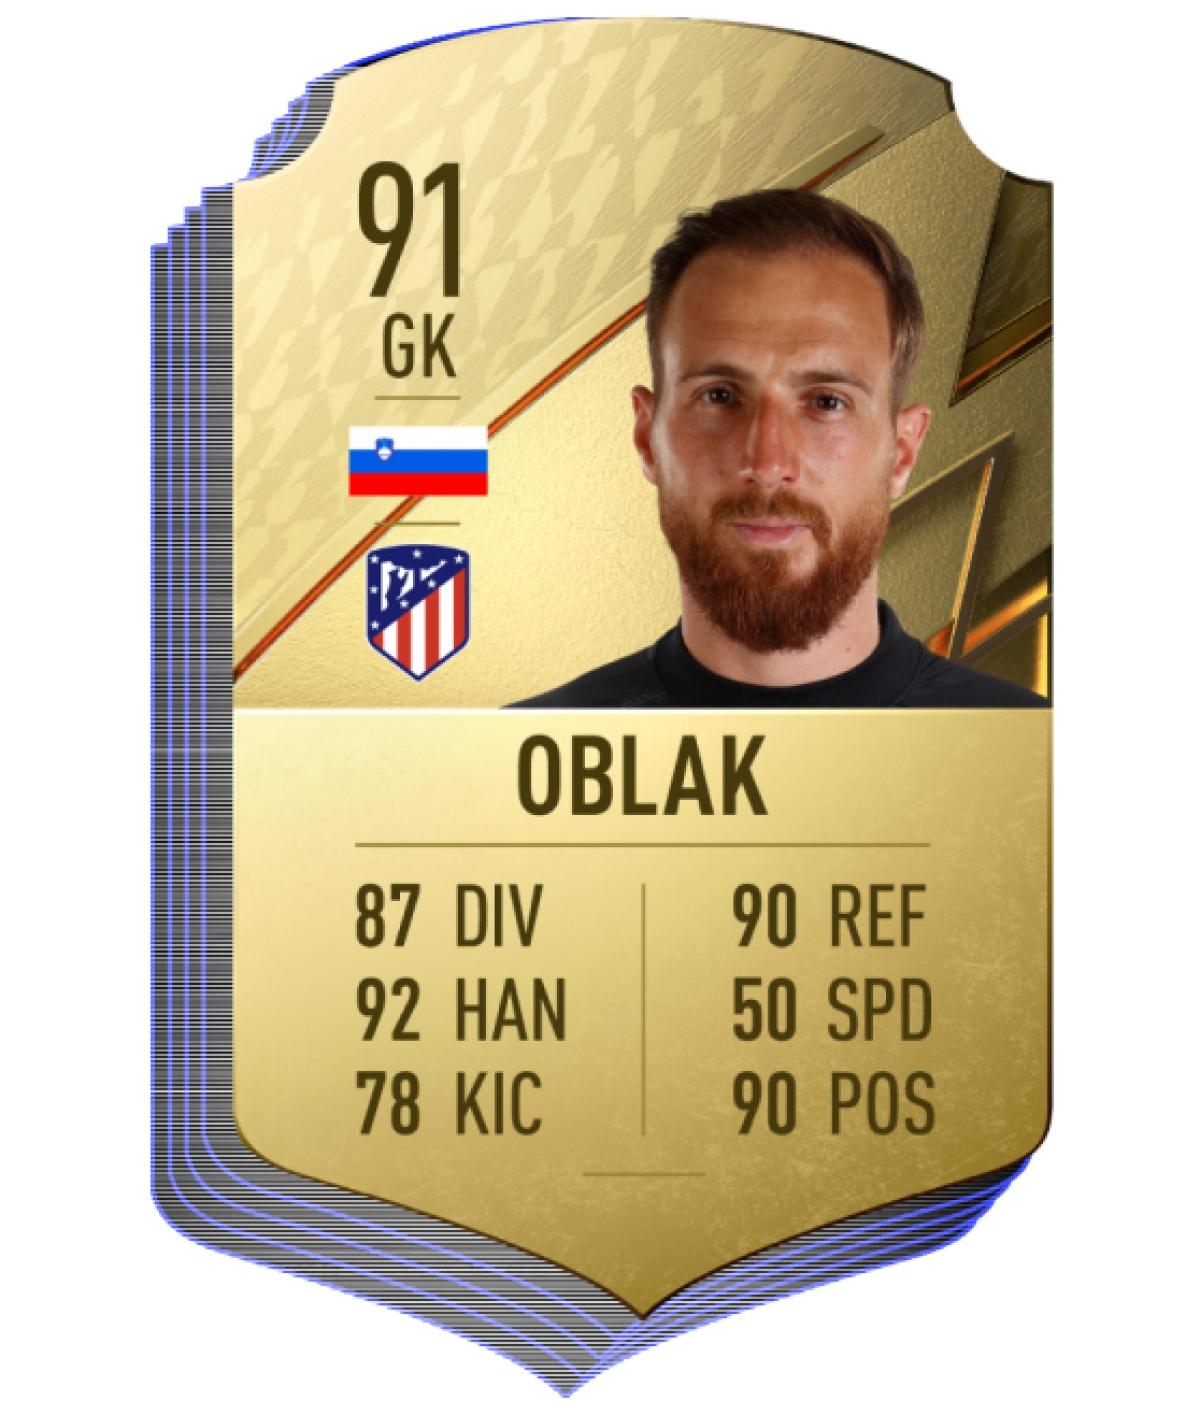 7. Jan Oblak (Atletico Madrid)   Chỉ số chung 91